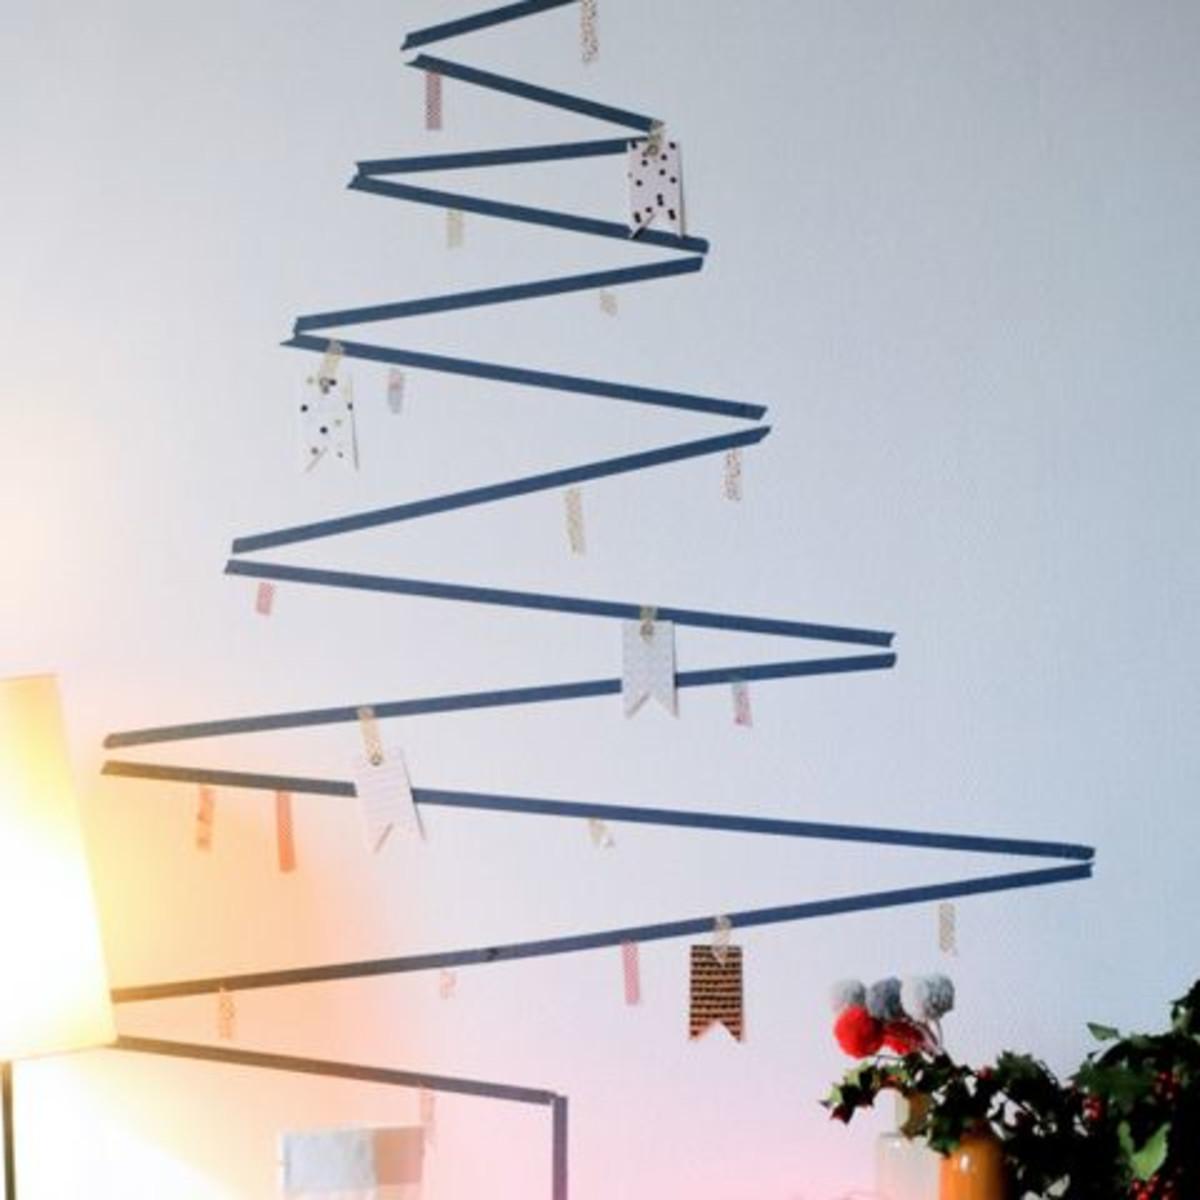 Alternative Christmas Trees.4 Festive Christmas Tree Alternatives That Will Spruce Up